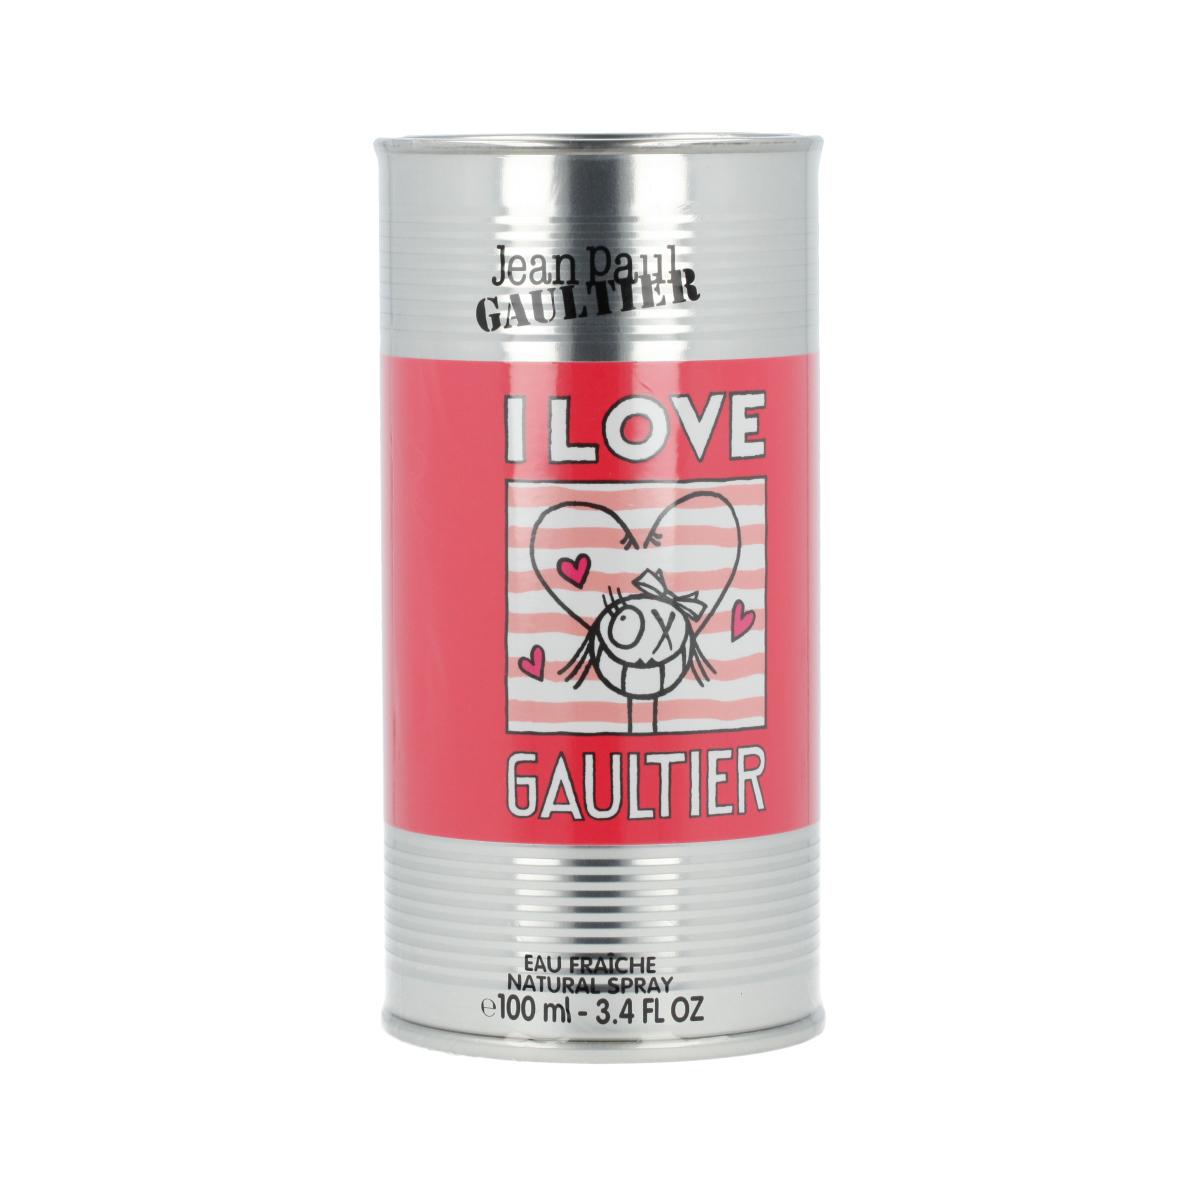 Jean Paul Gaultier Classique I Love Gaultier Eau Fraîche 100 ml (woman) 12793